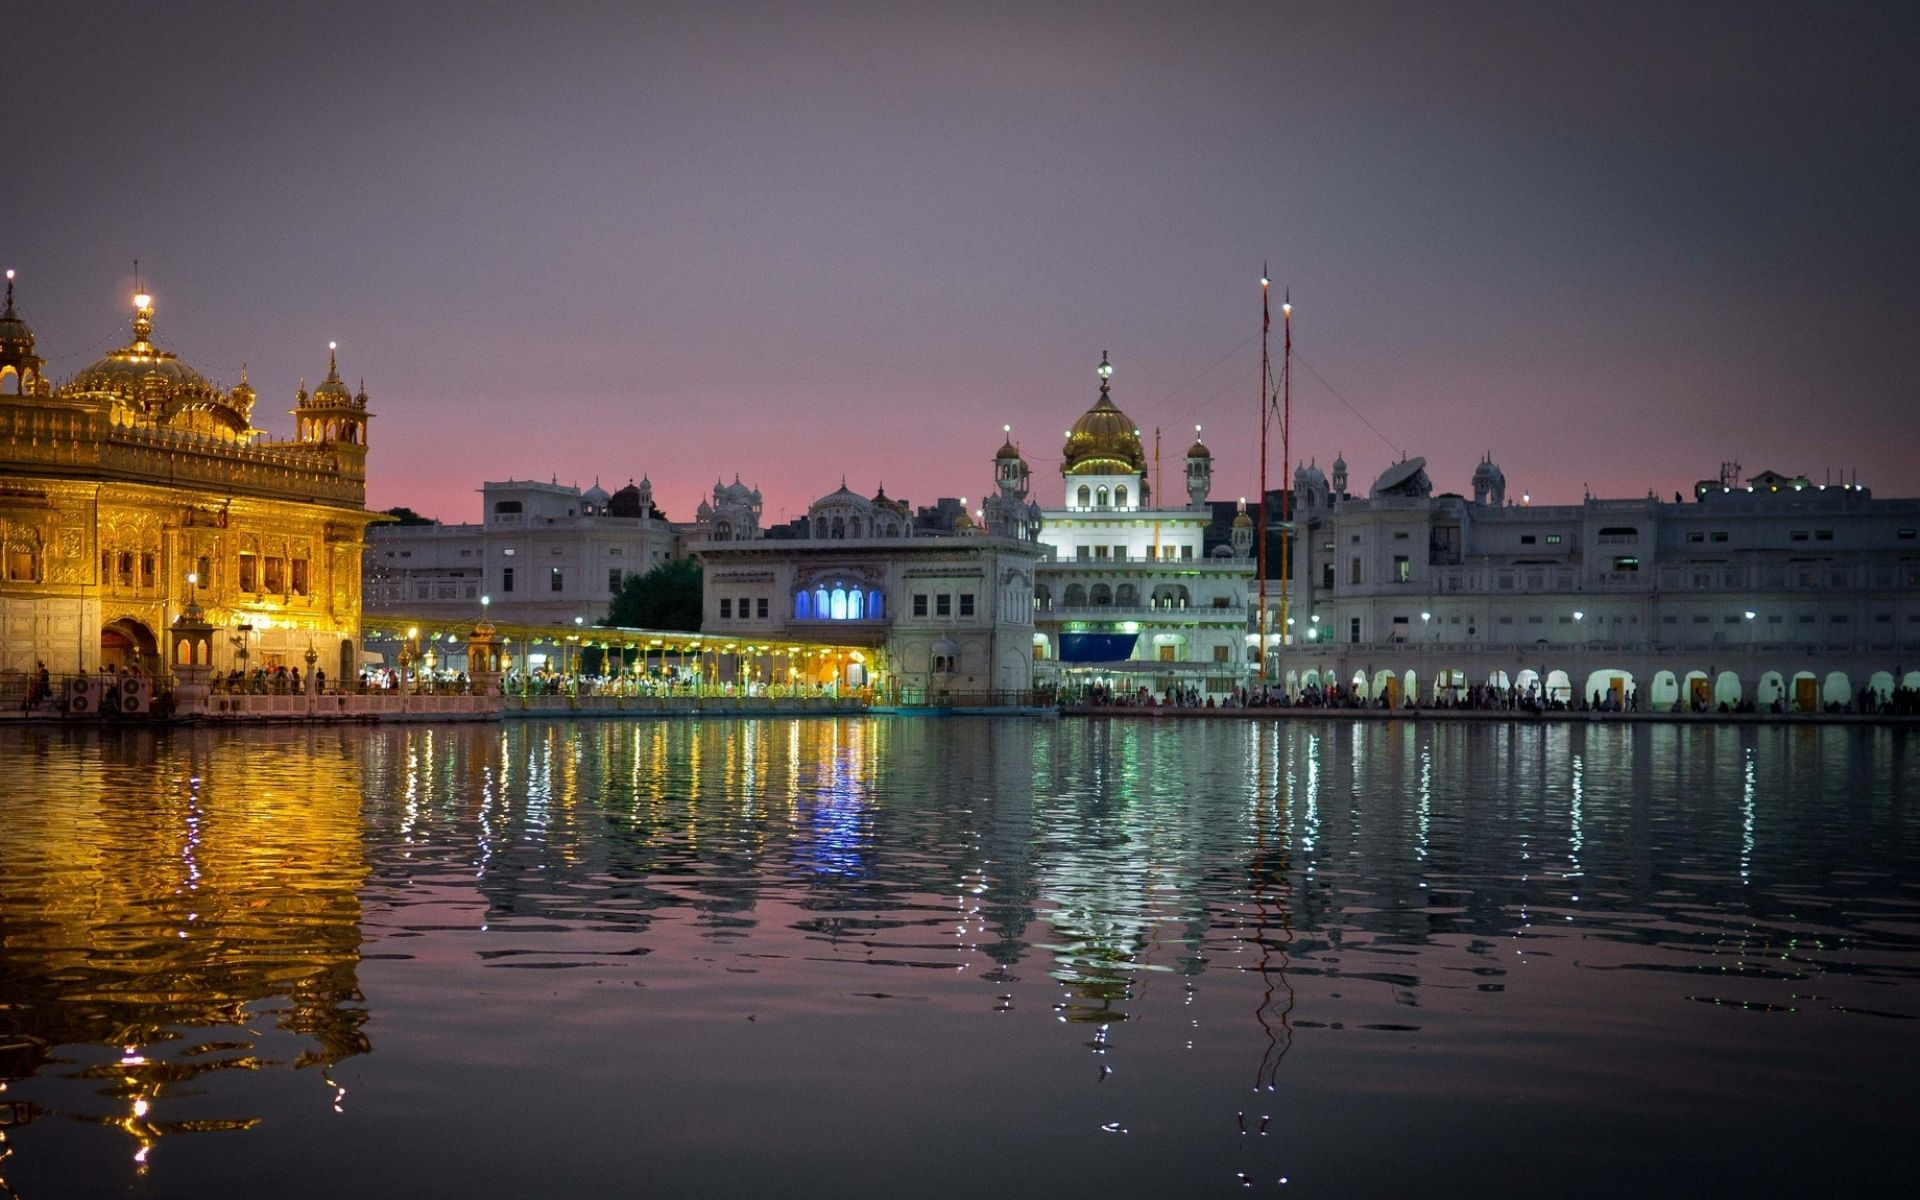 amritsar-india-punjab-city-view-hd-wallpaper-free-desktop